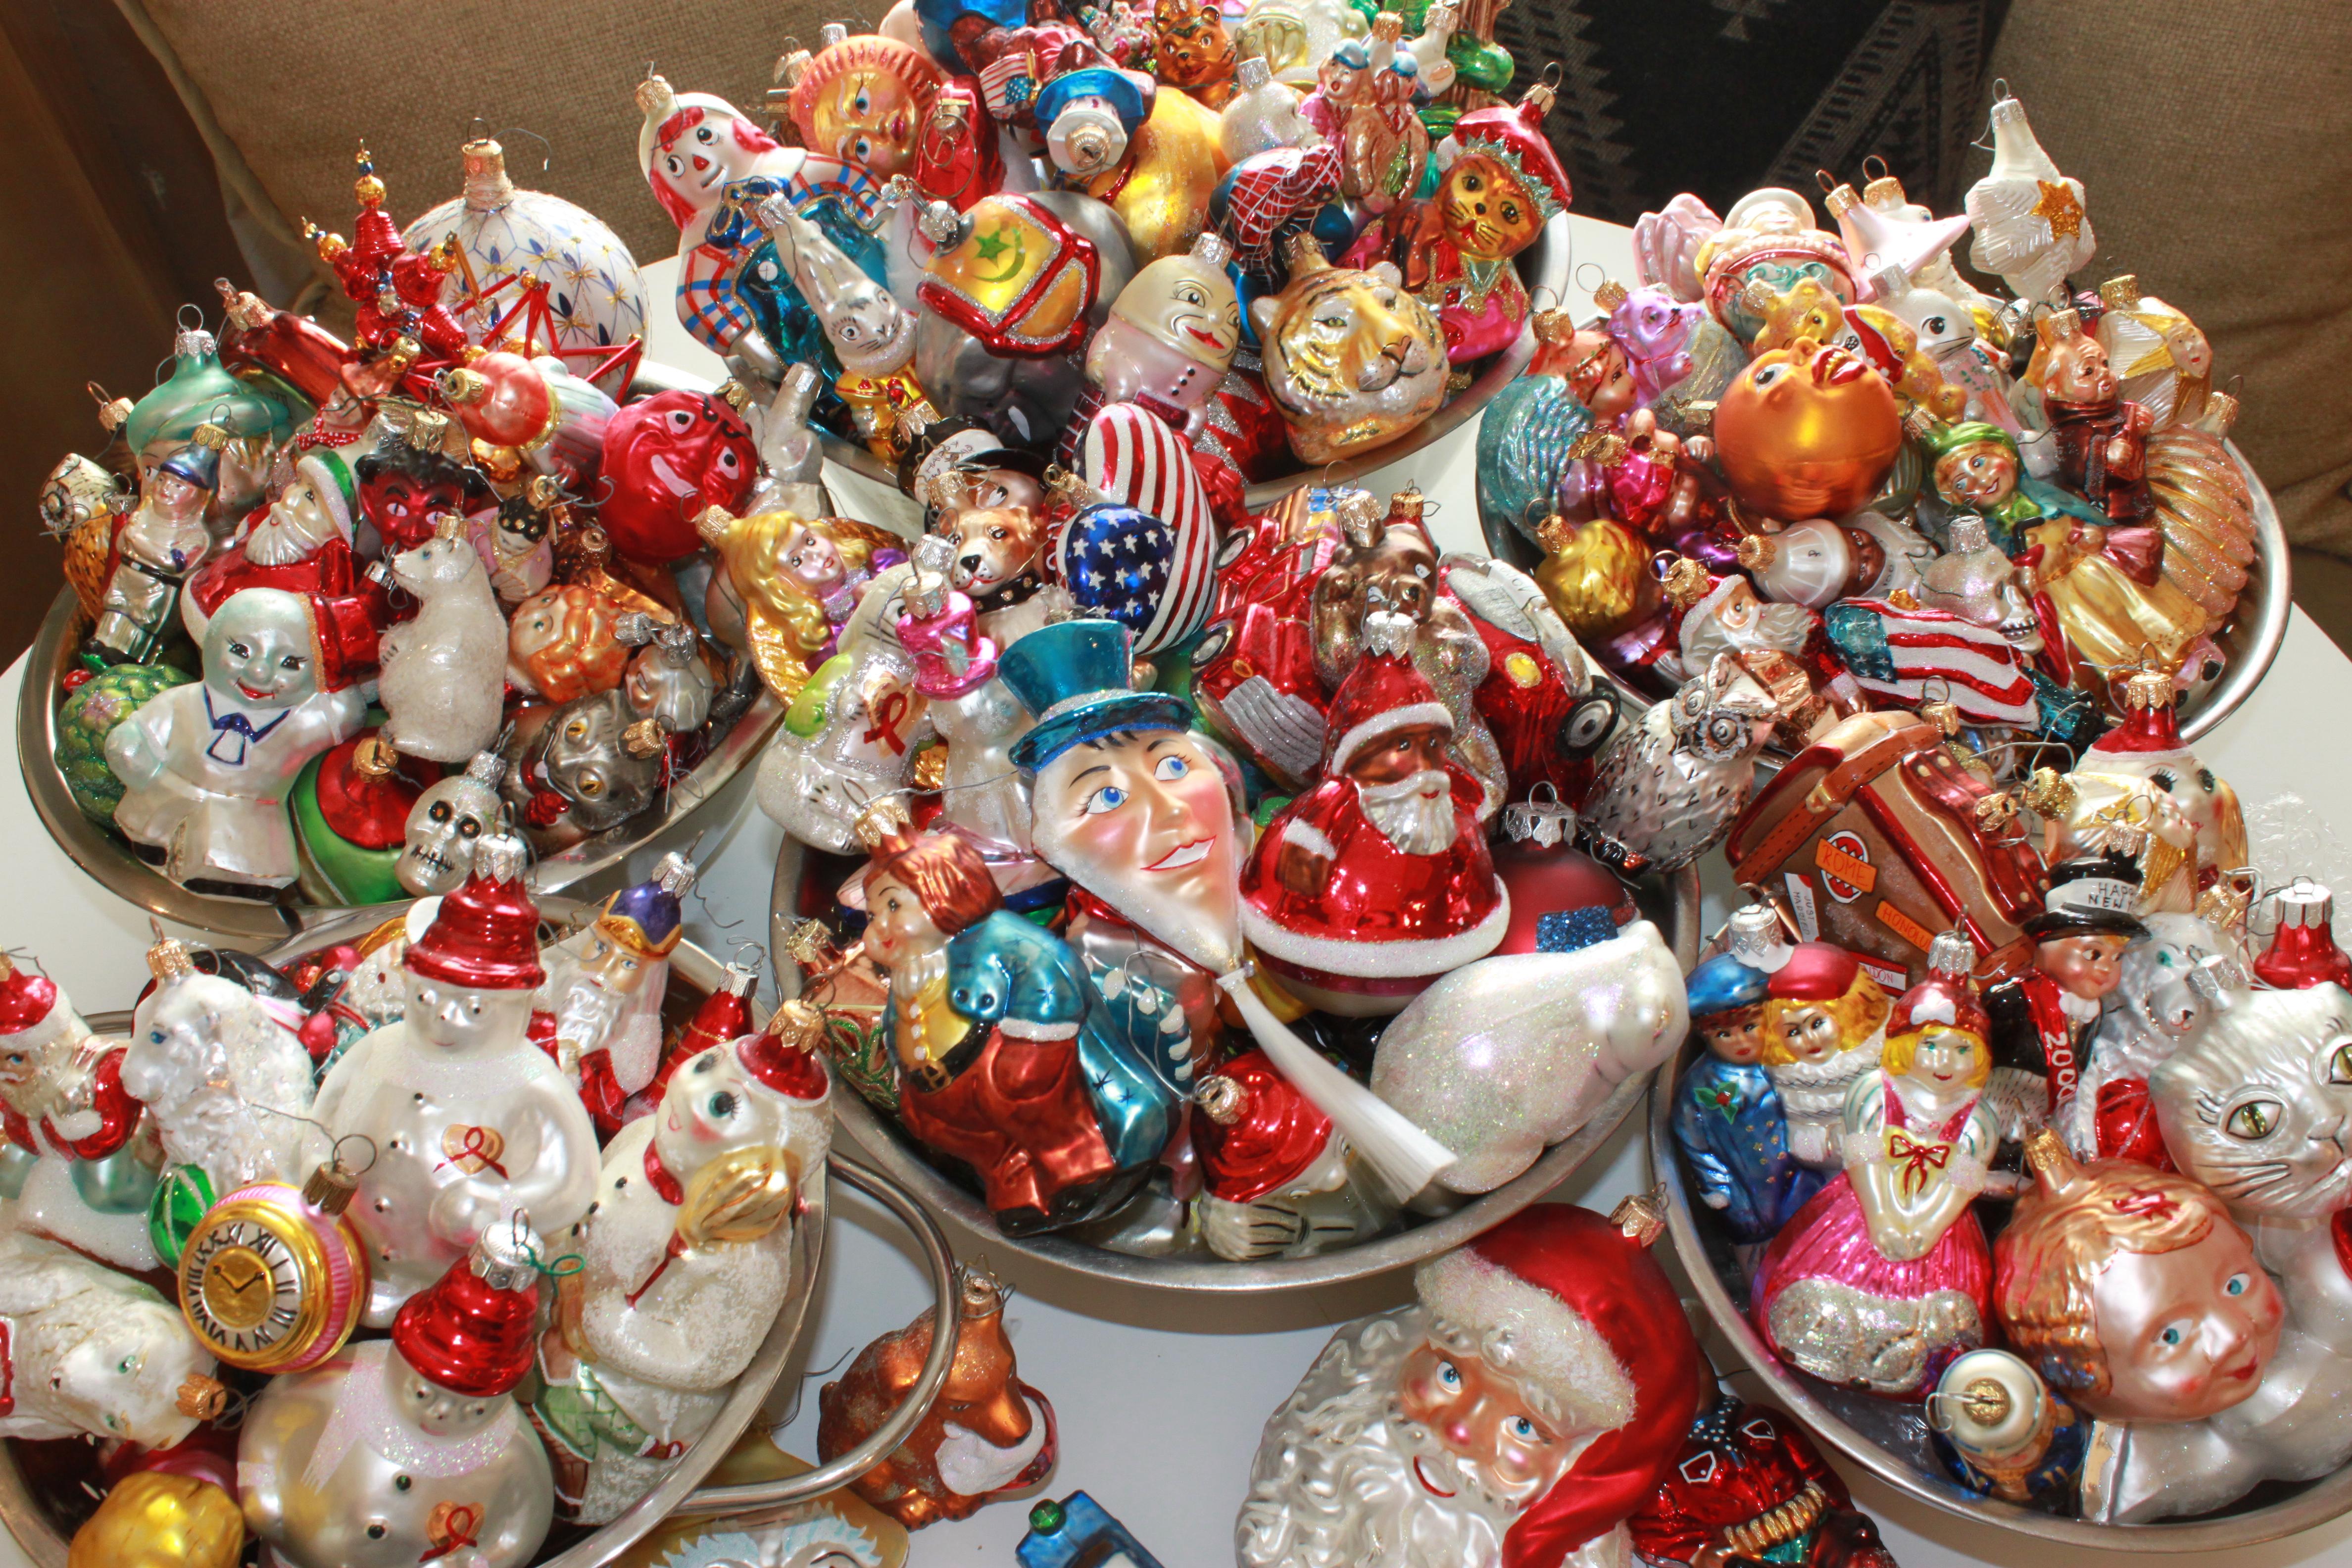 German glass ornaments - As